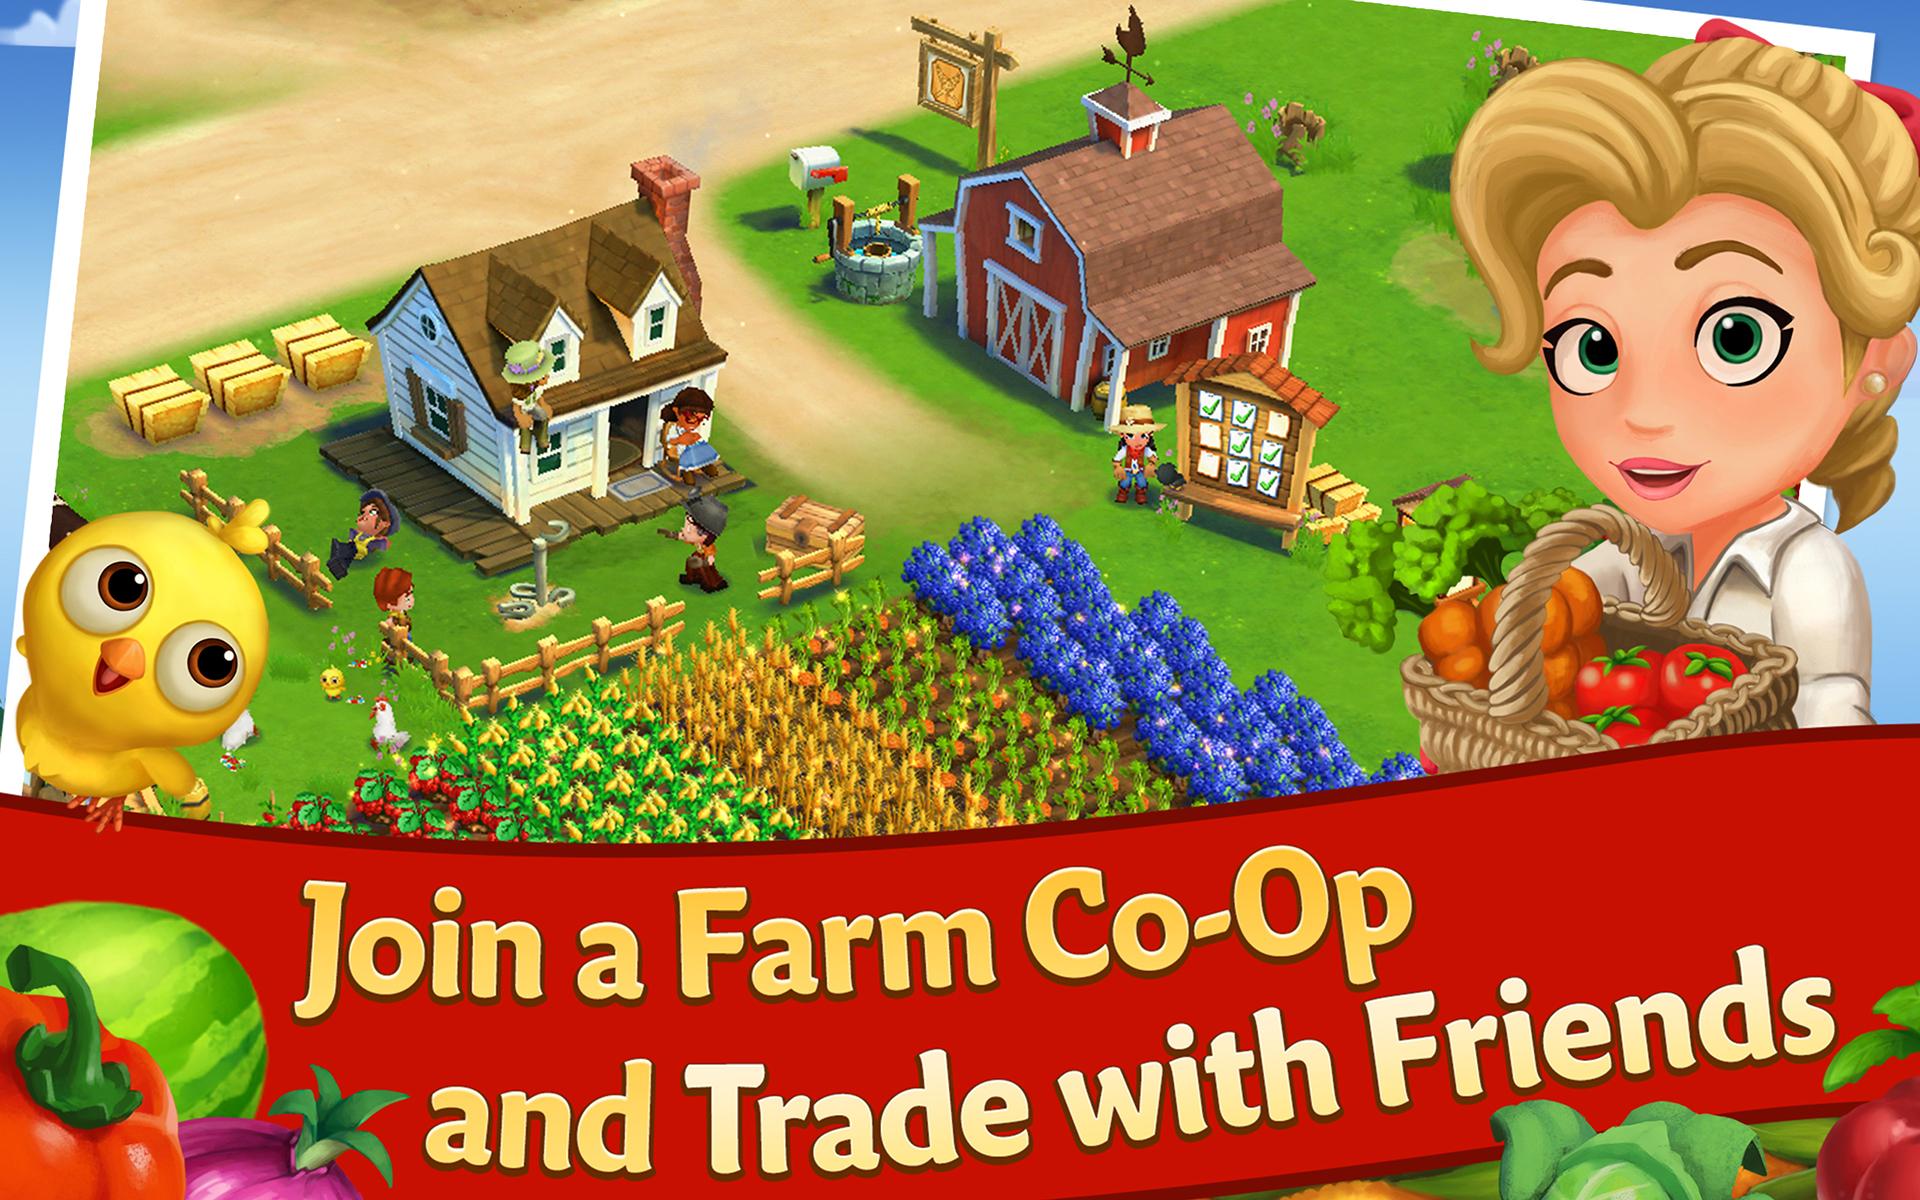 Amazon.com: FarmVille 2: Country Escape: Appstore for Android